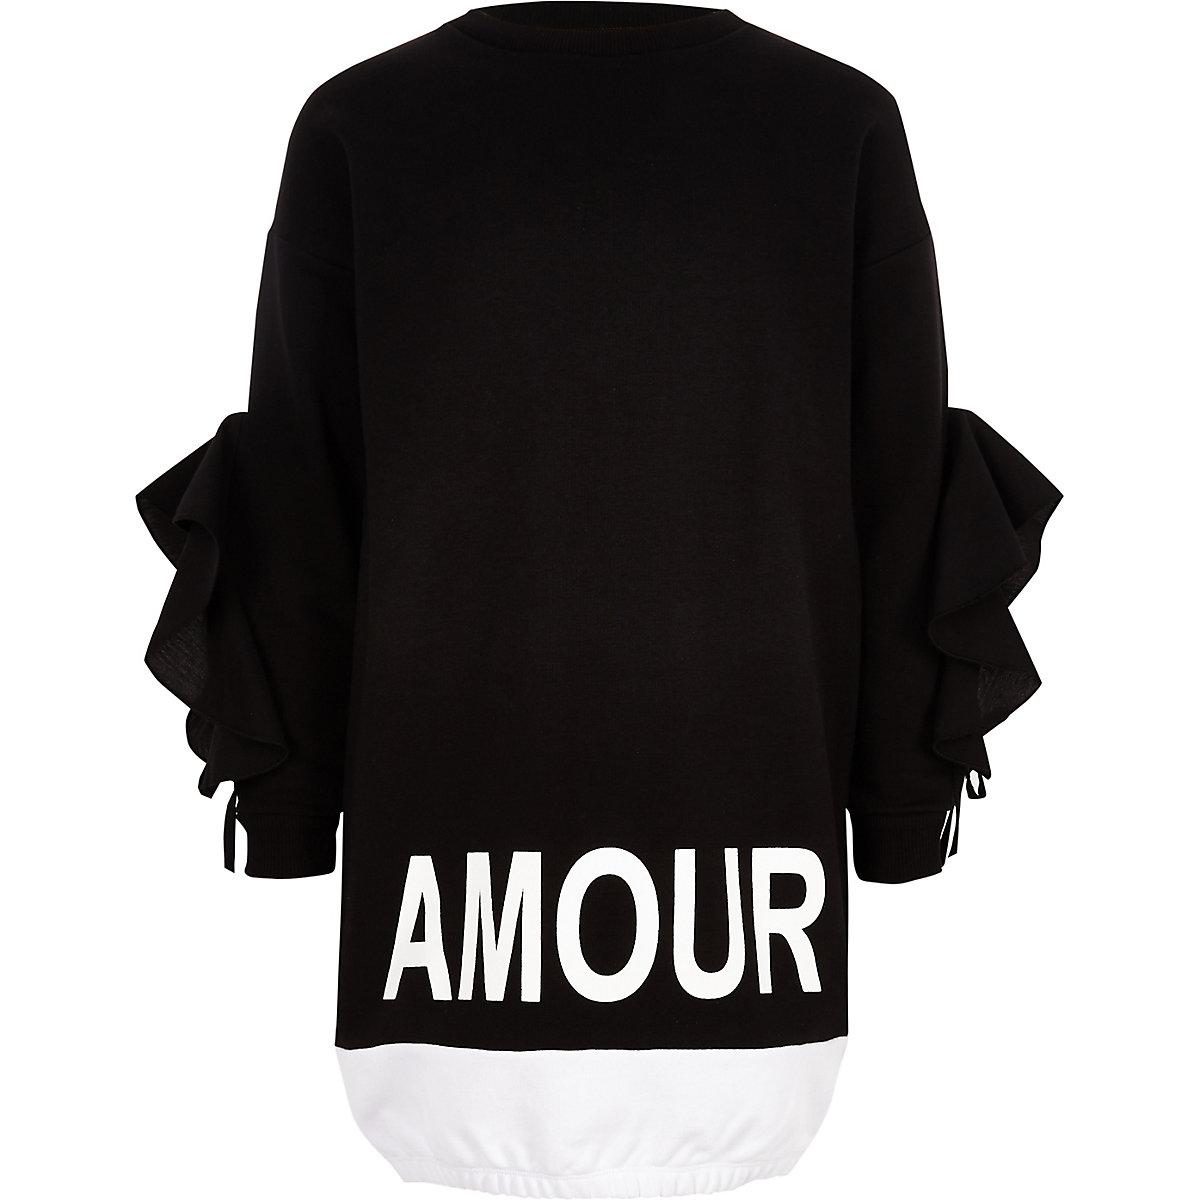 Girls black 'amour' print sweatshirt dress